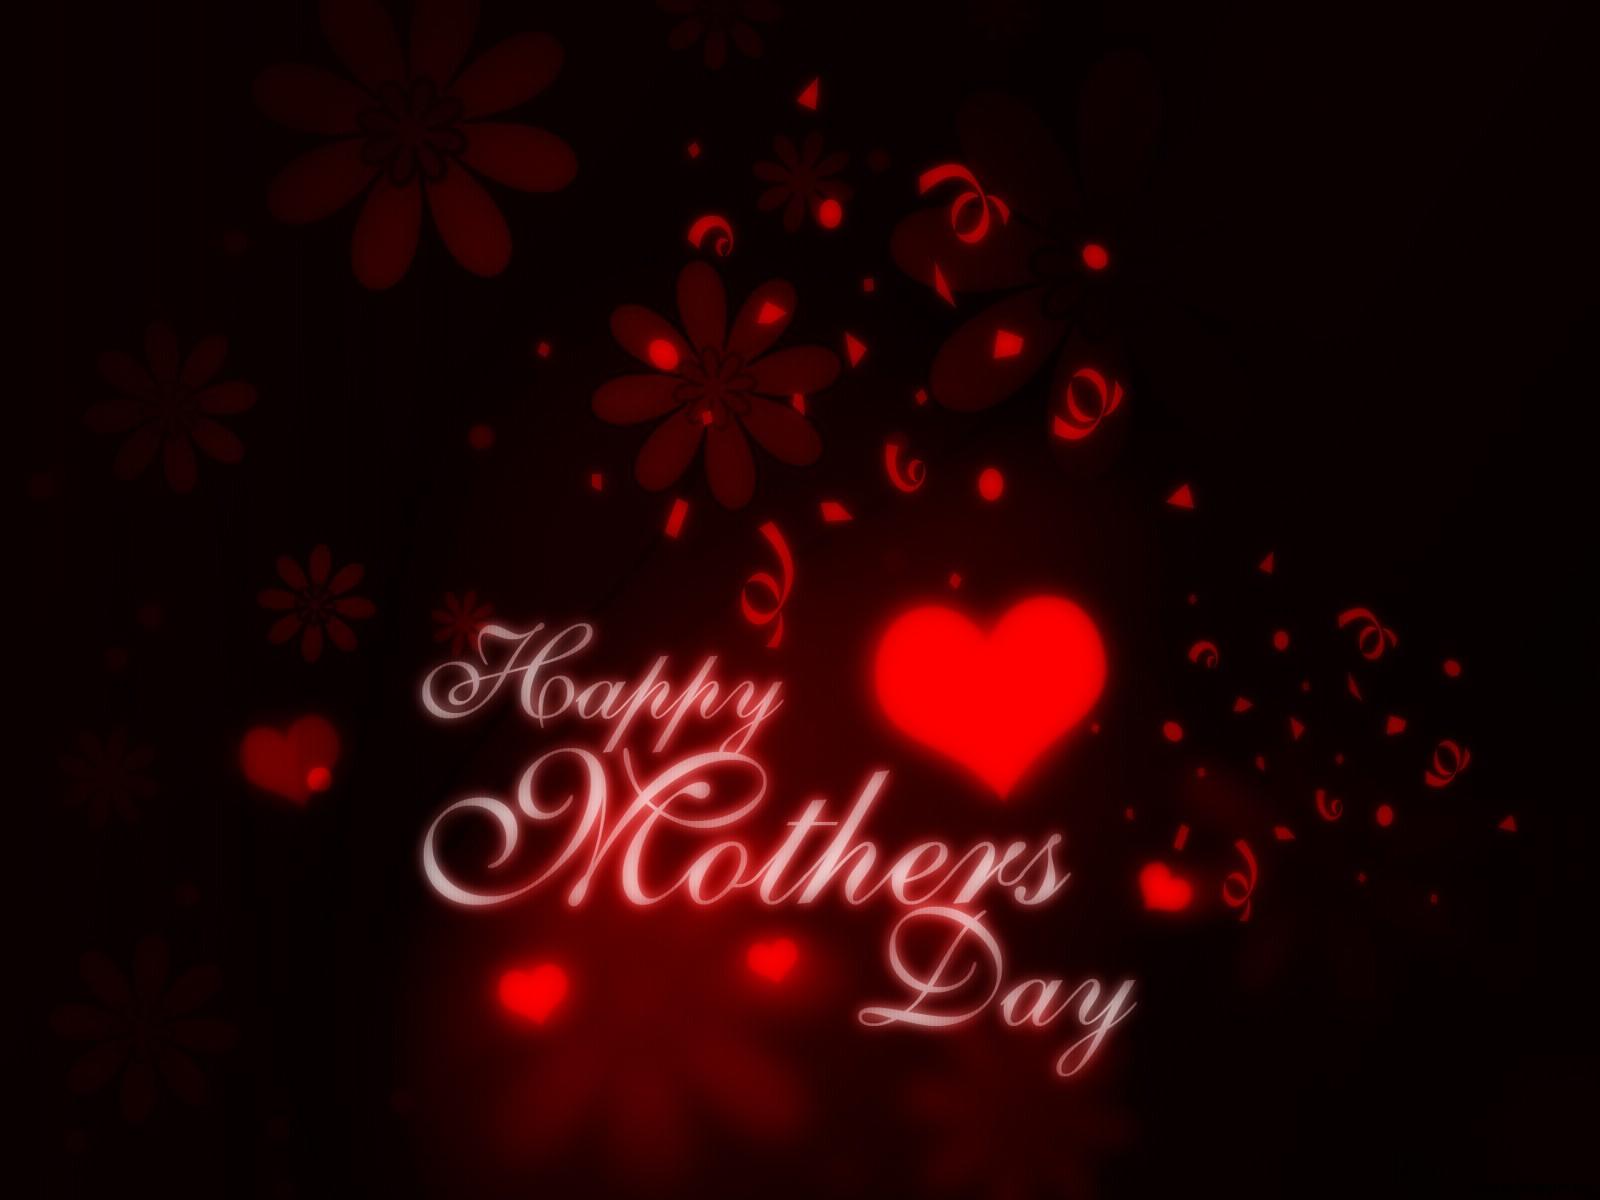 Happy Mothers Day Wallpaper HDjpg 1600x1200